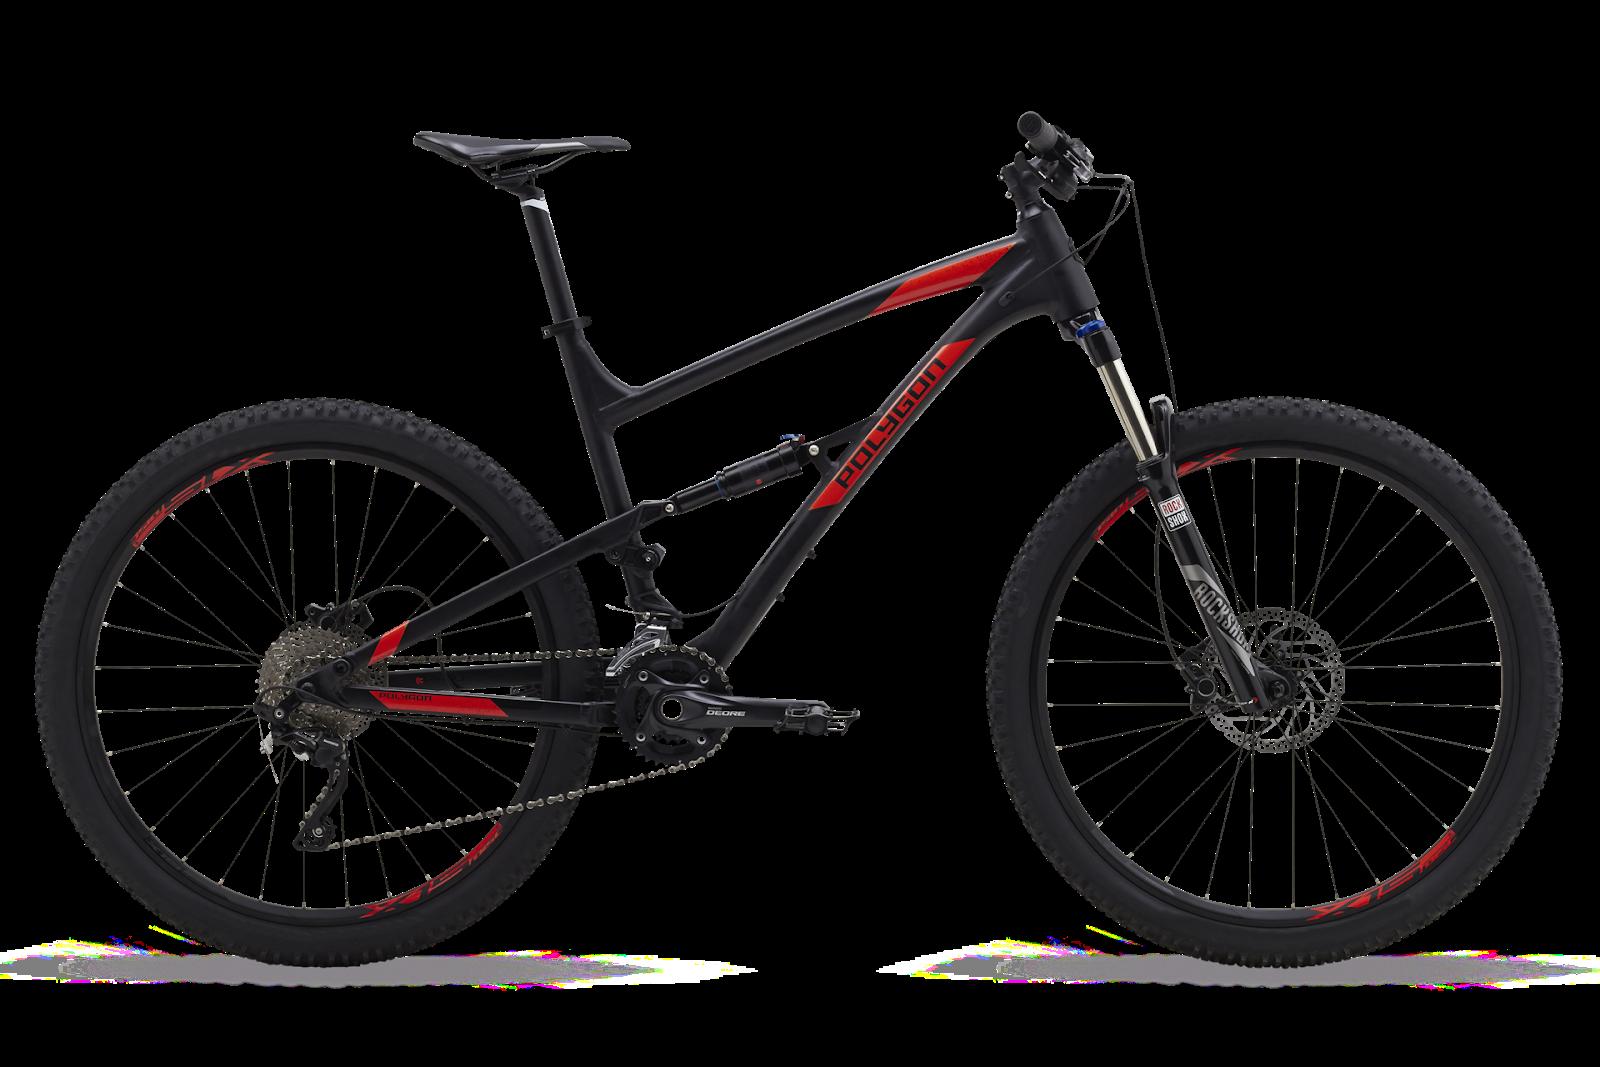 Sepeda Polygon Siskiu D7 2019 Harga Rp. 10.250.000 Serba